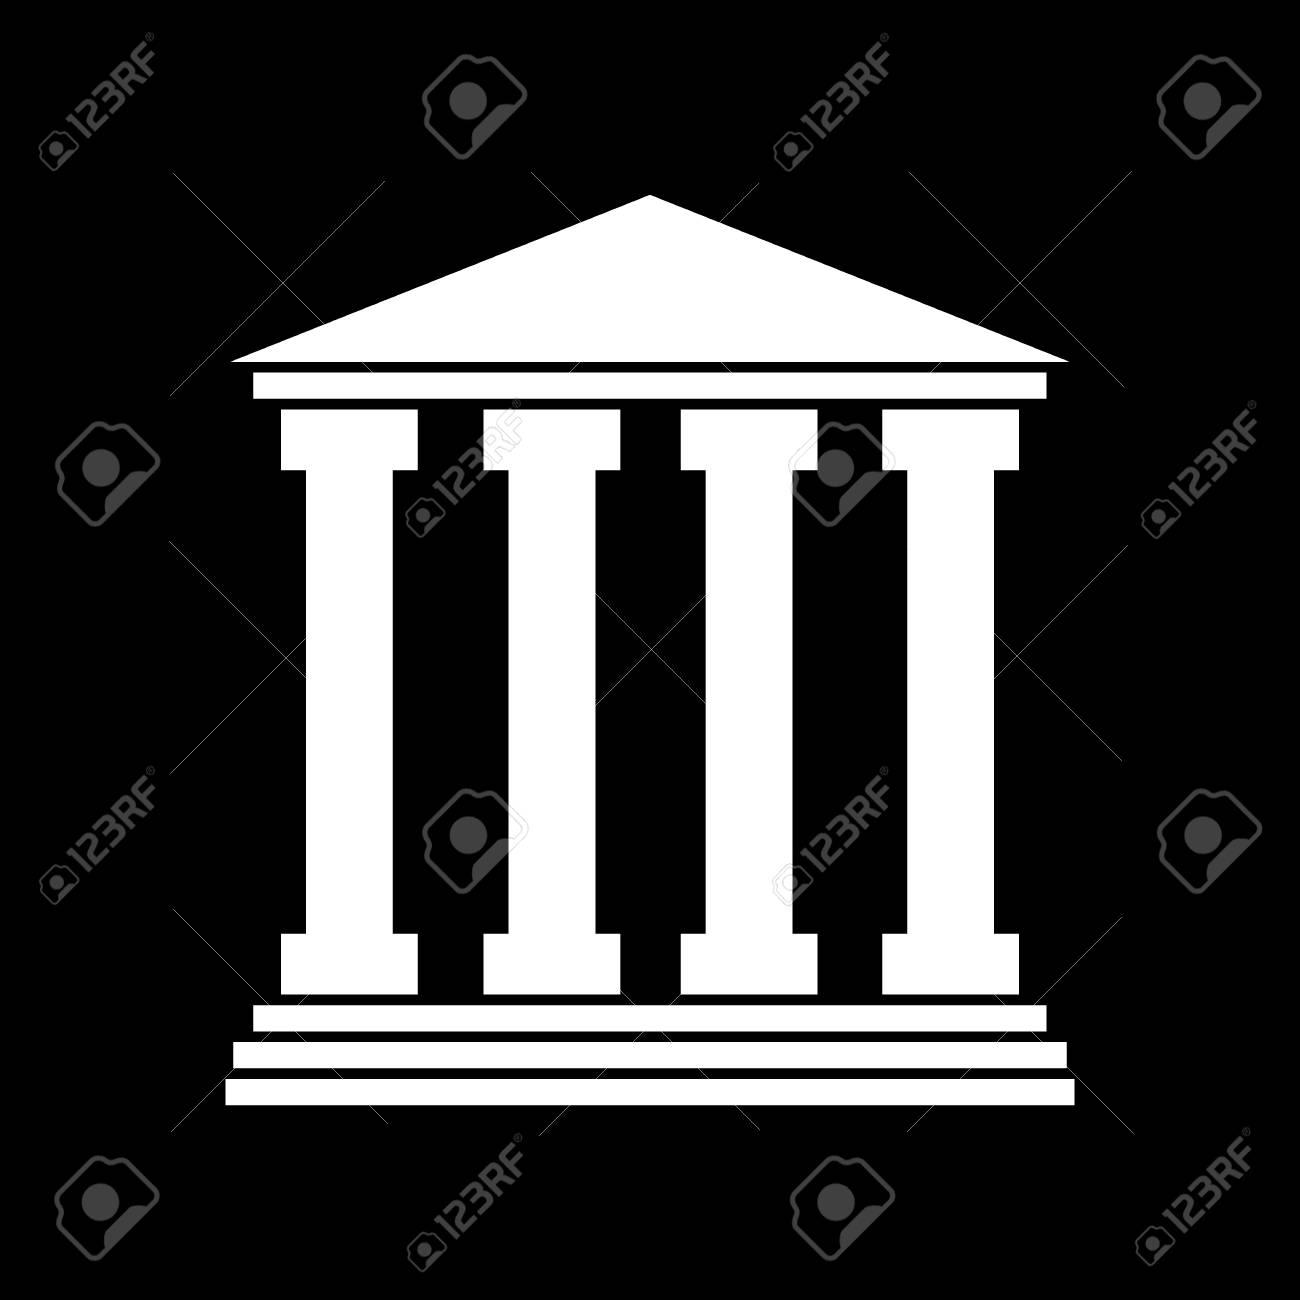 Icon Of Courthouse   White Illustration On Black Background 1300x1300